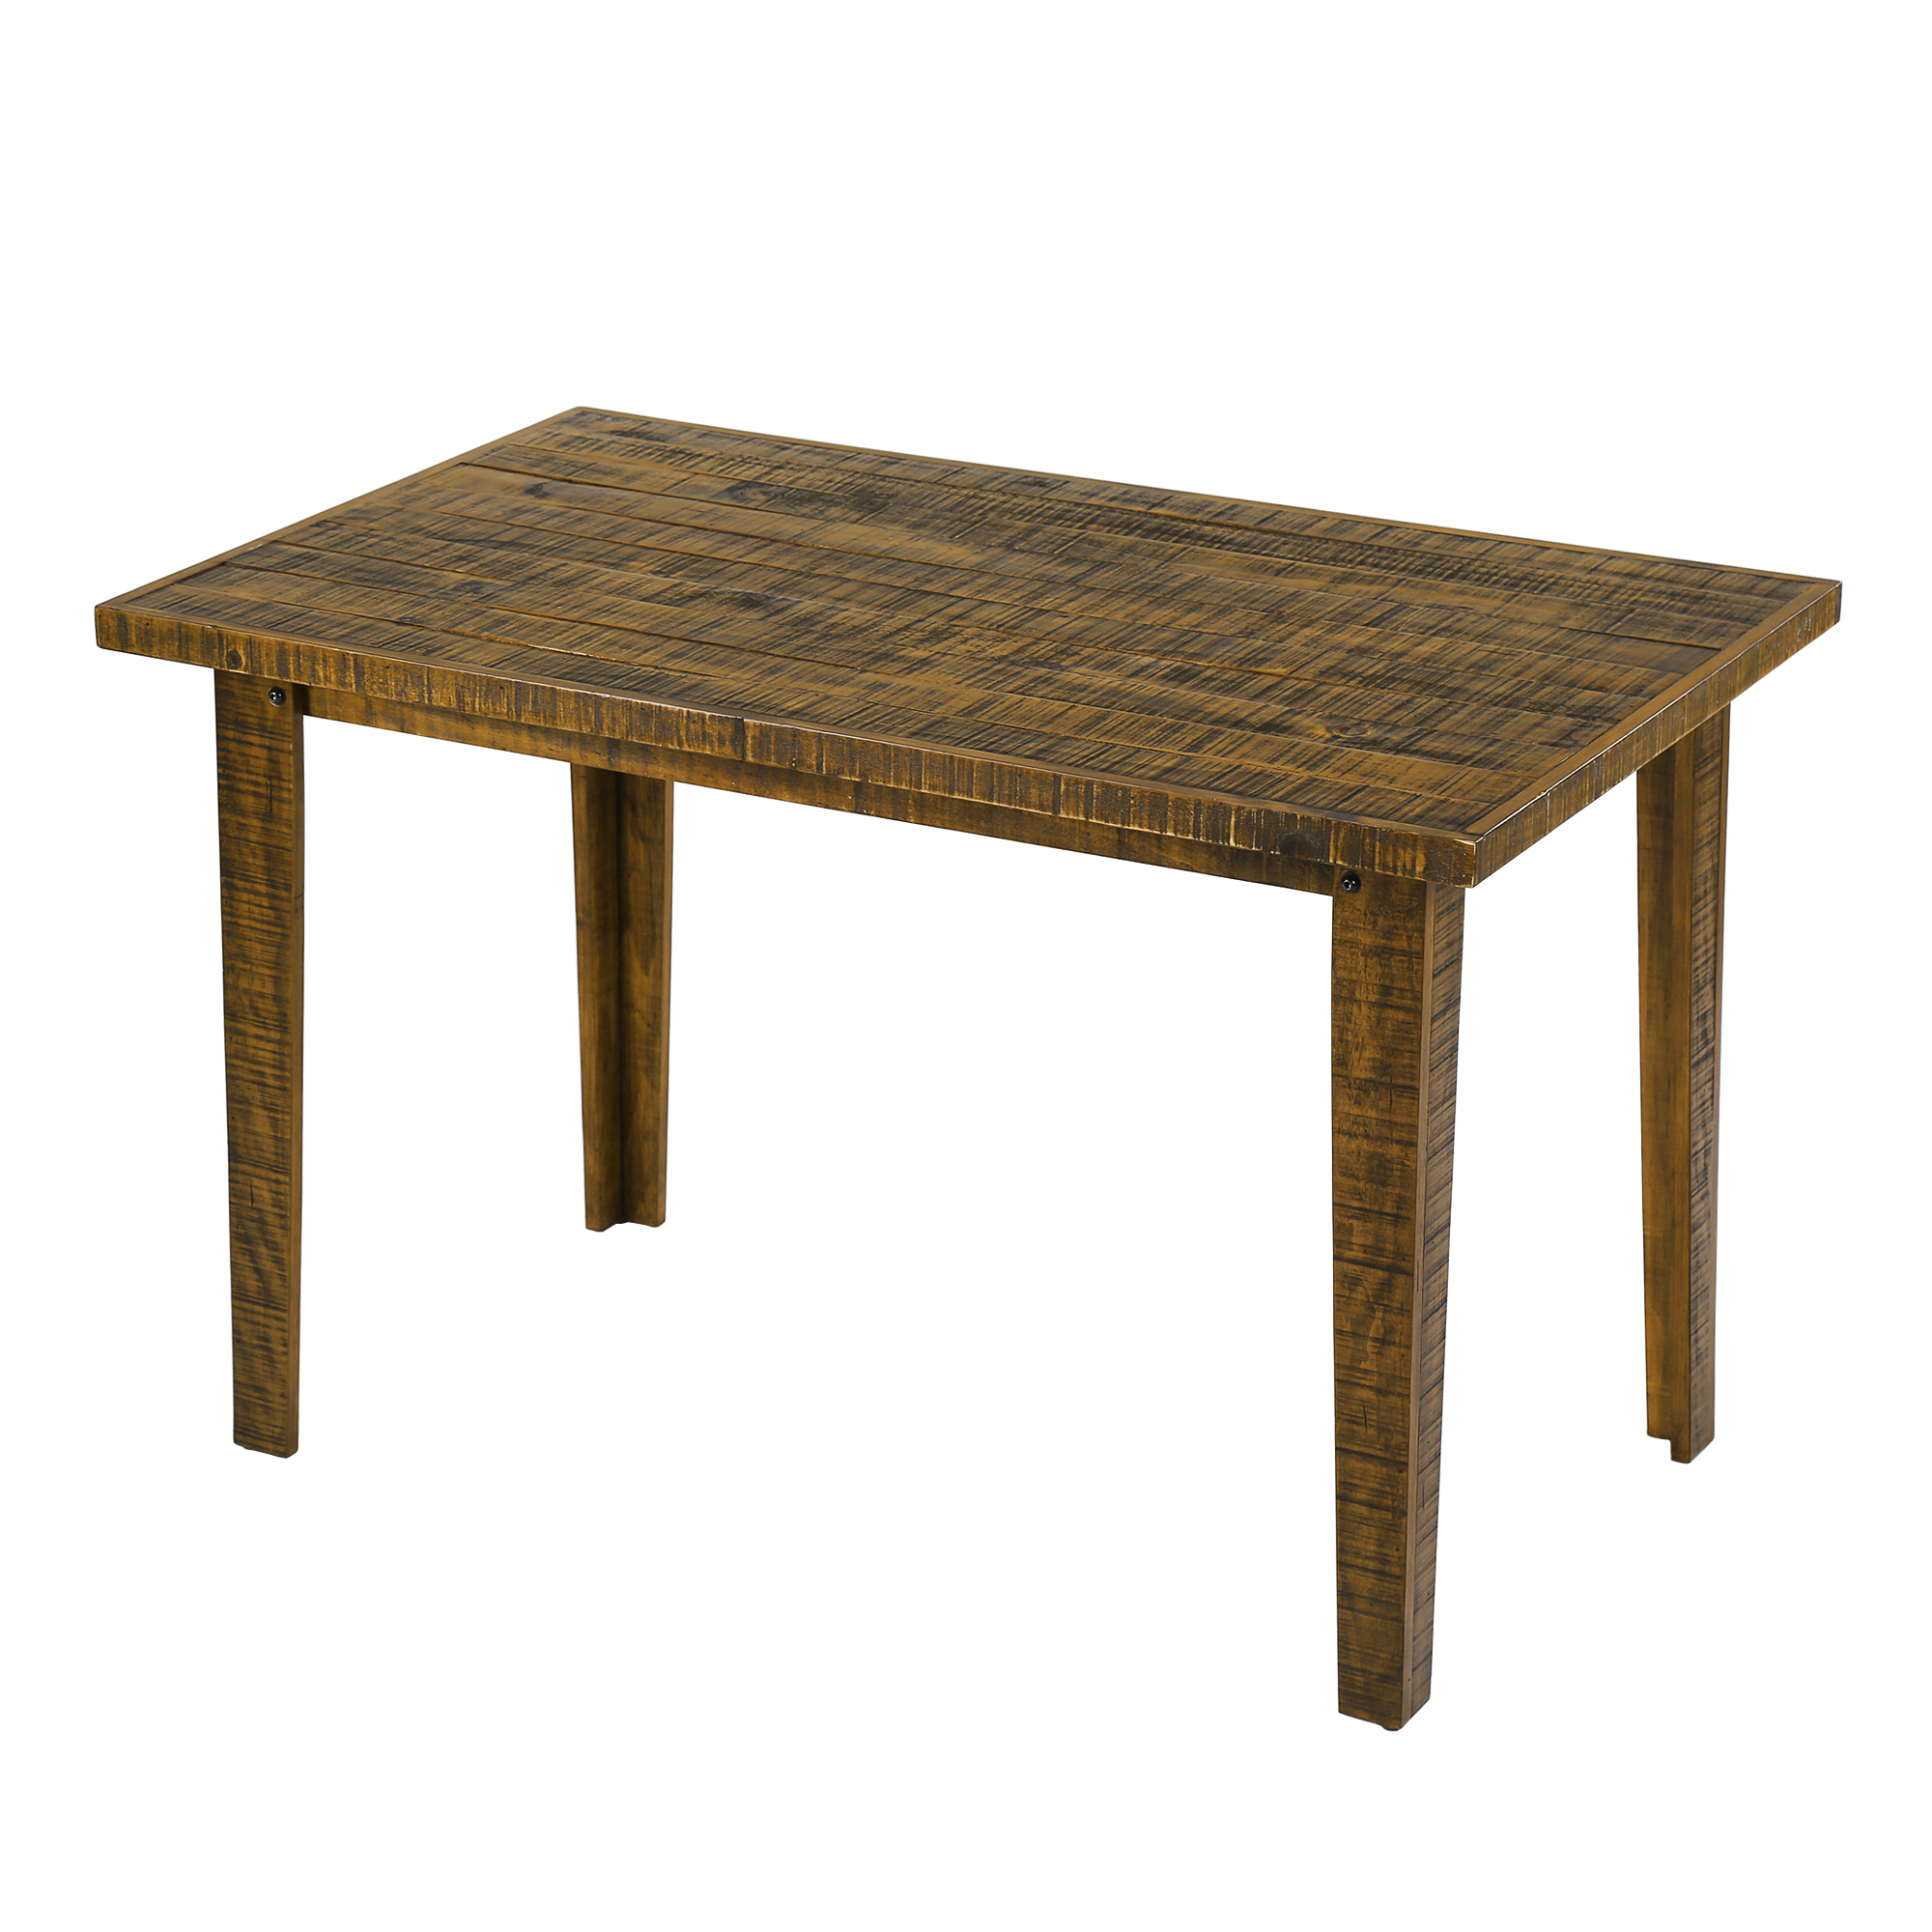 GranRest Classic Pine Soild Wood Dining Table